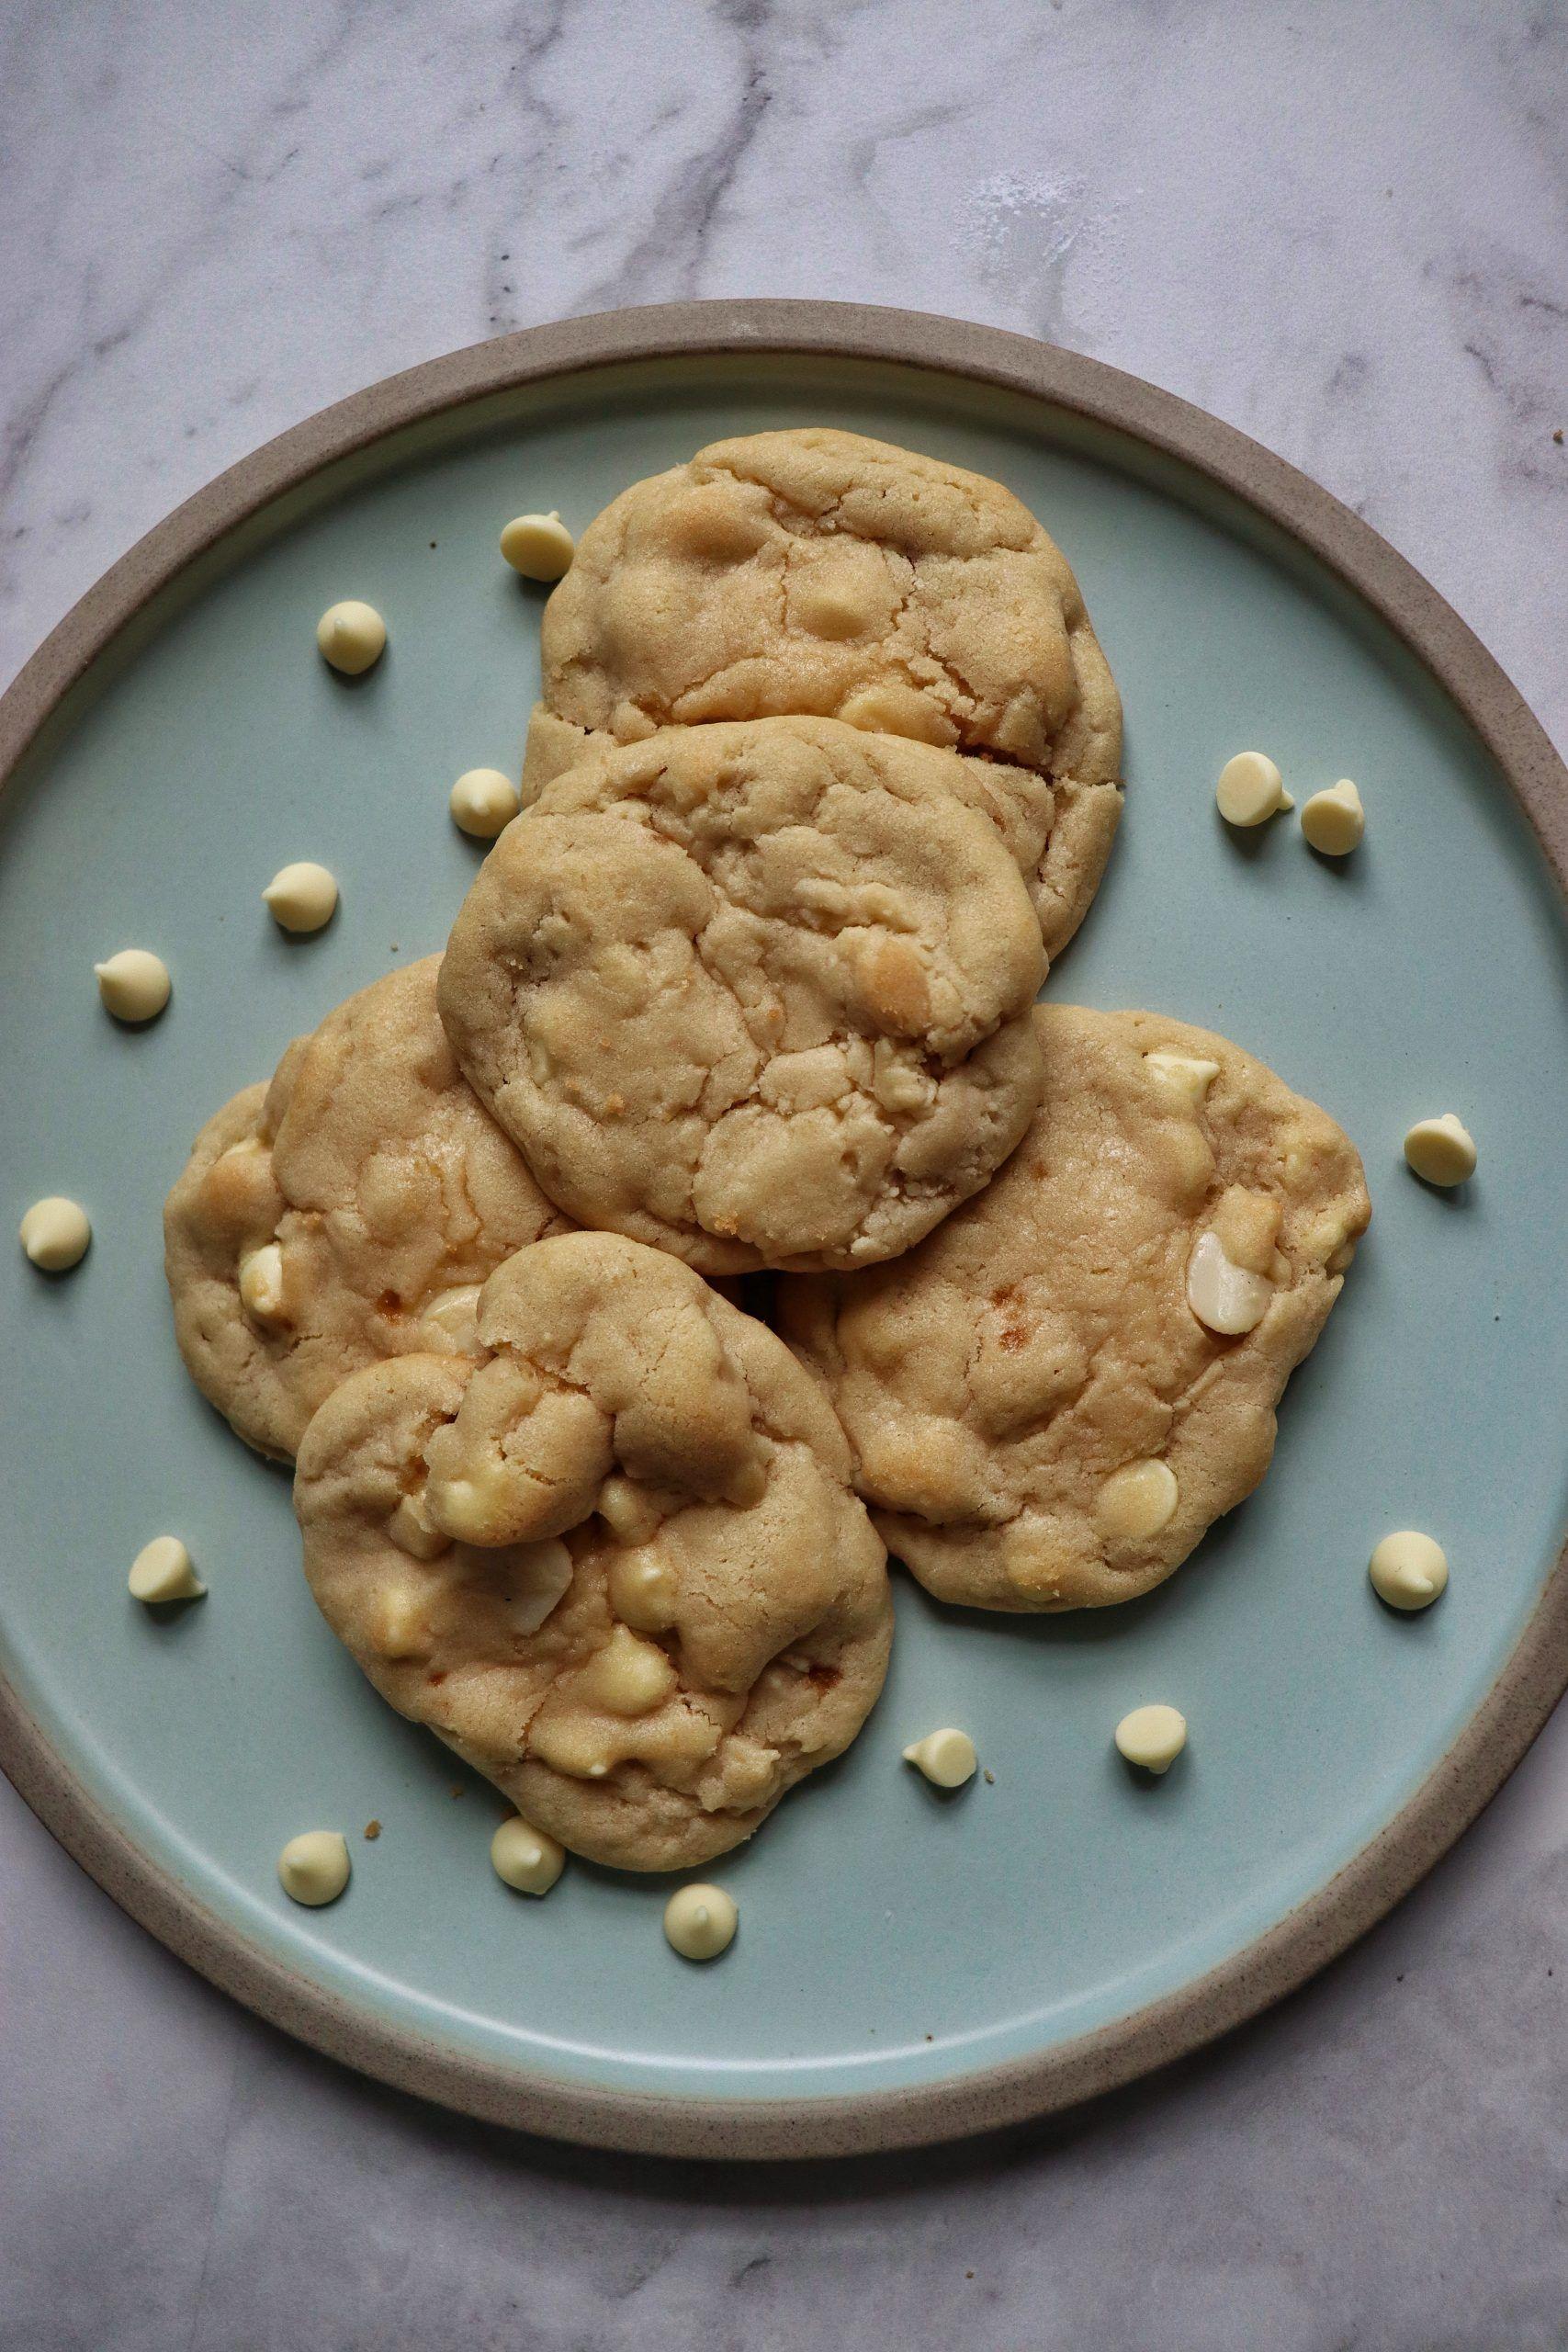 White Chocolate Macadamia Nut Cookies Subway Copycat Recipe White Chocolate Macadamia Nut Cookies Macadamia Nut Cookies Chocolate Macadamia Nut Cookie